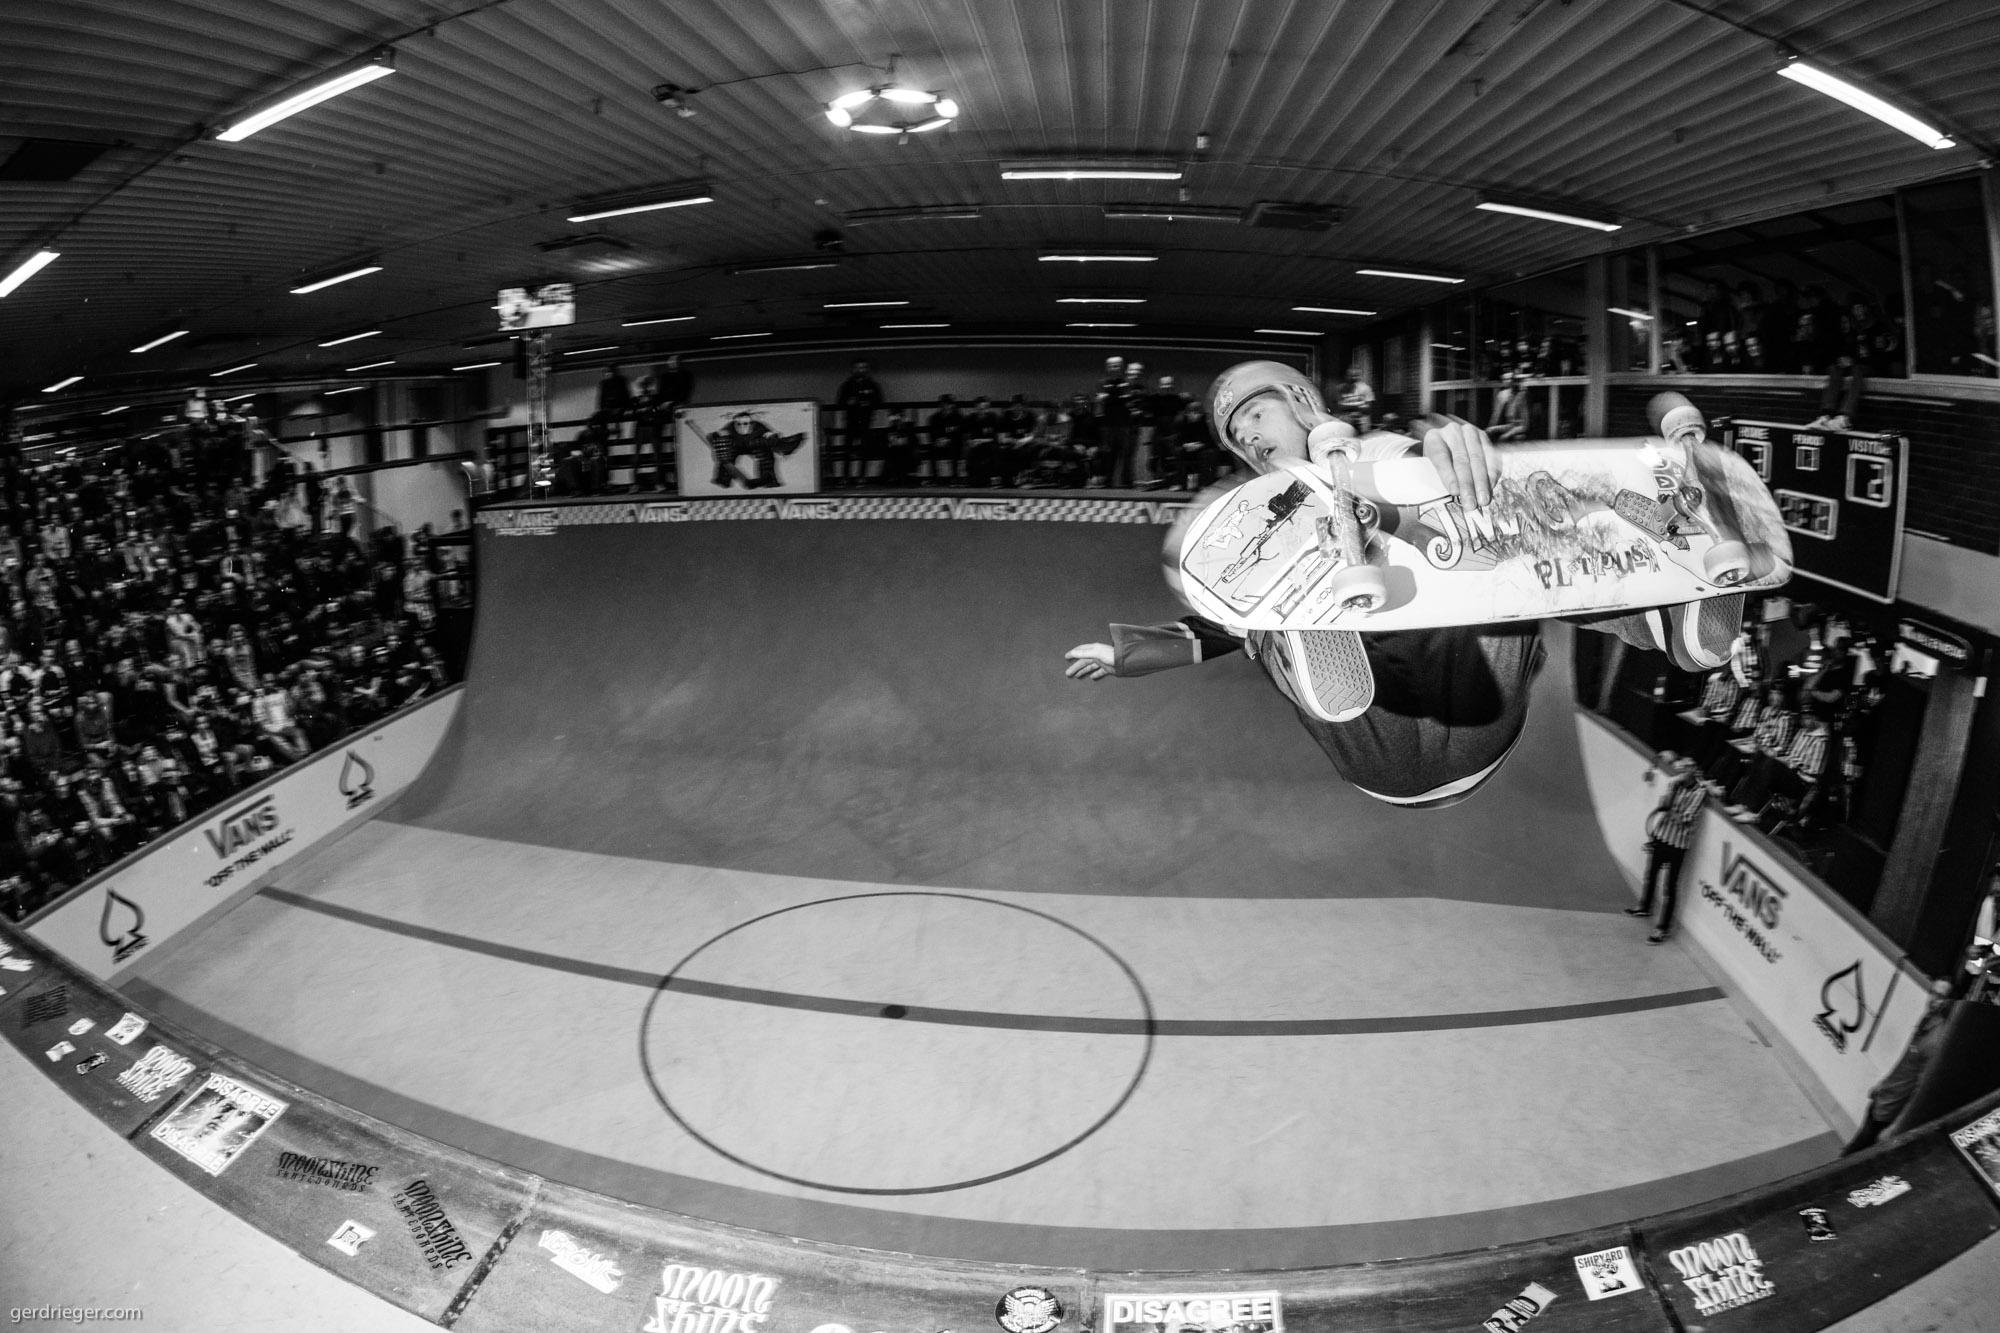 97db8140ddf John Magnusson – attcked the ramp in true hockey fashion